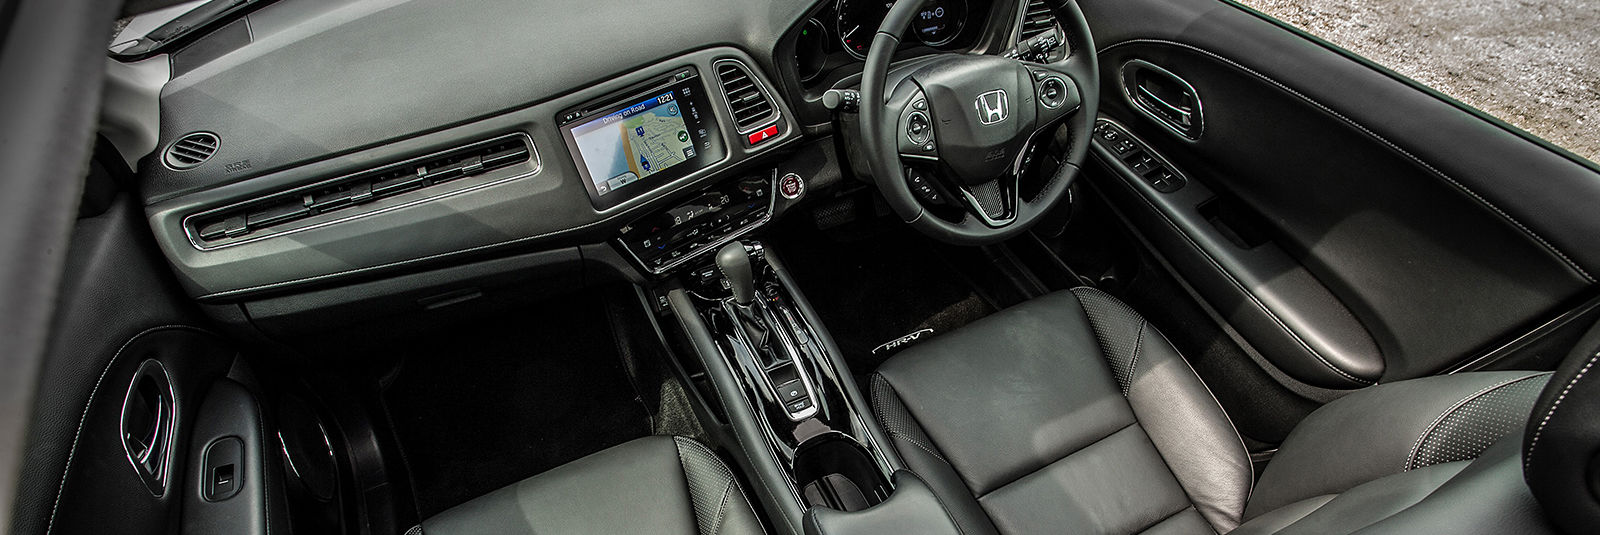 Honda Hrv Interior Dimensions | www.indiepedia.org